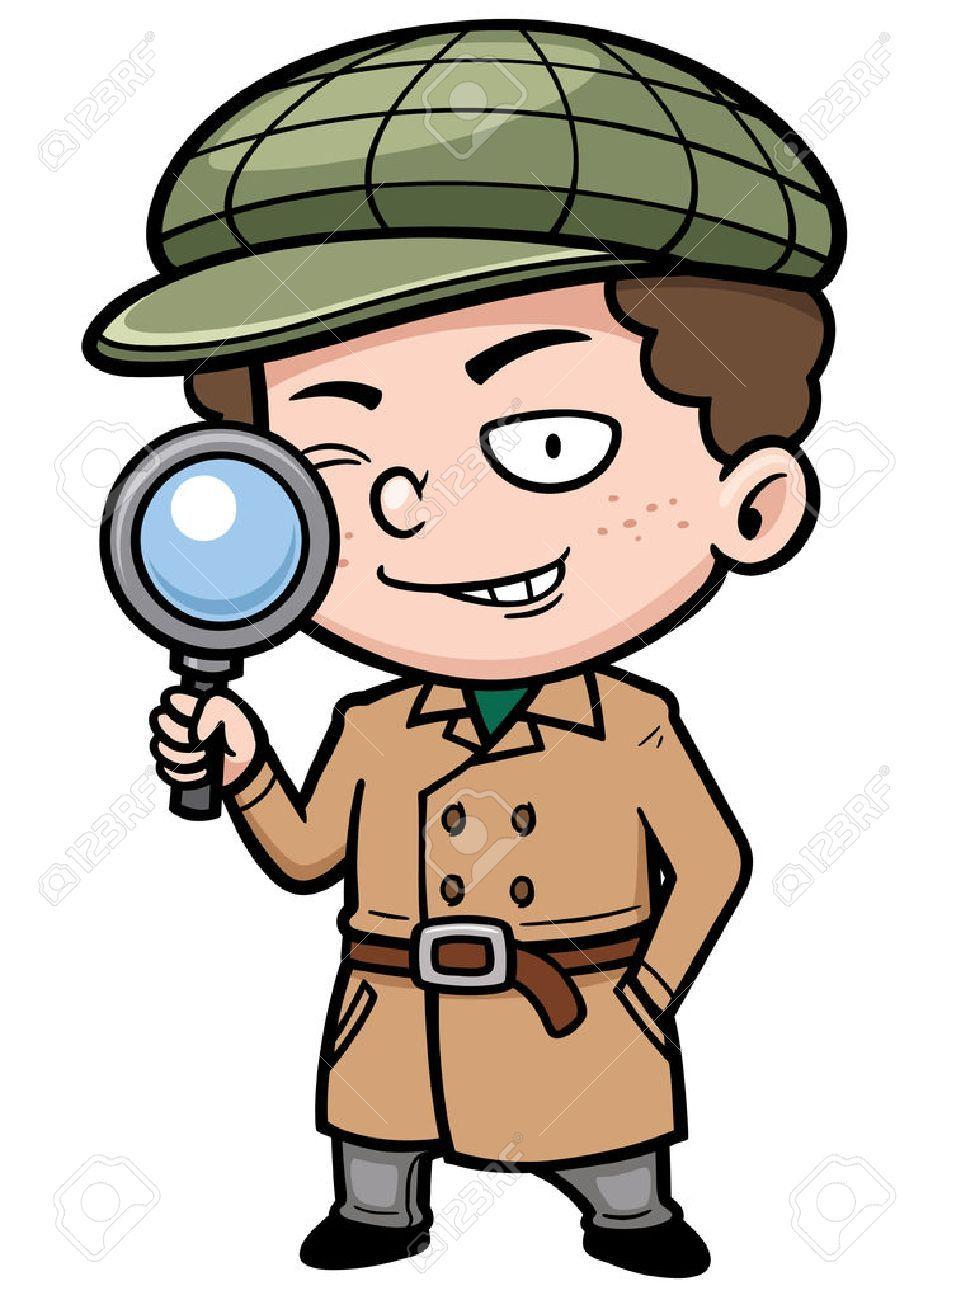 Detective clipart boy. Stock photo detectives fictional